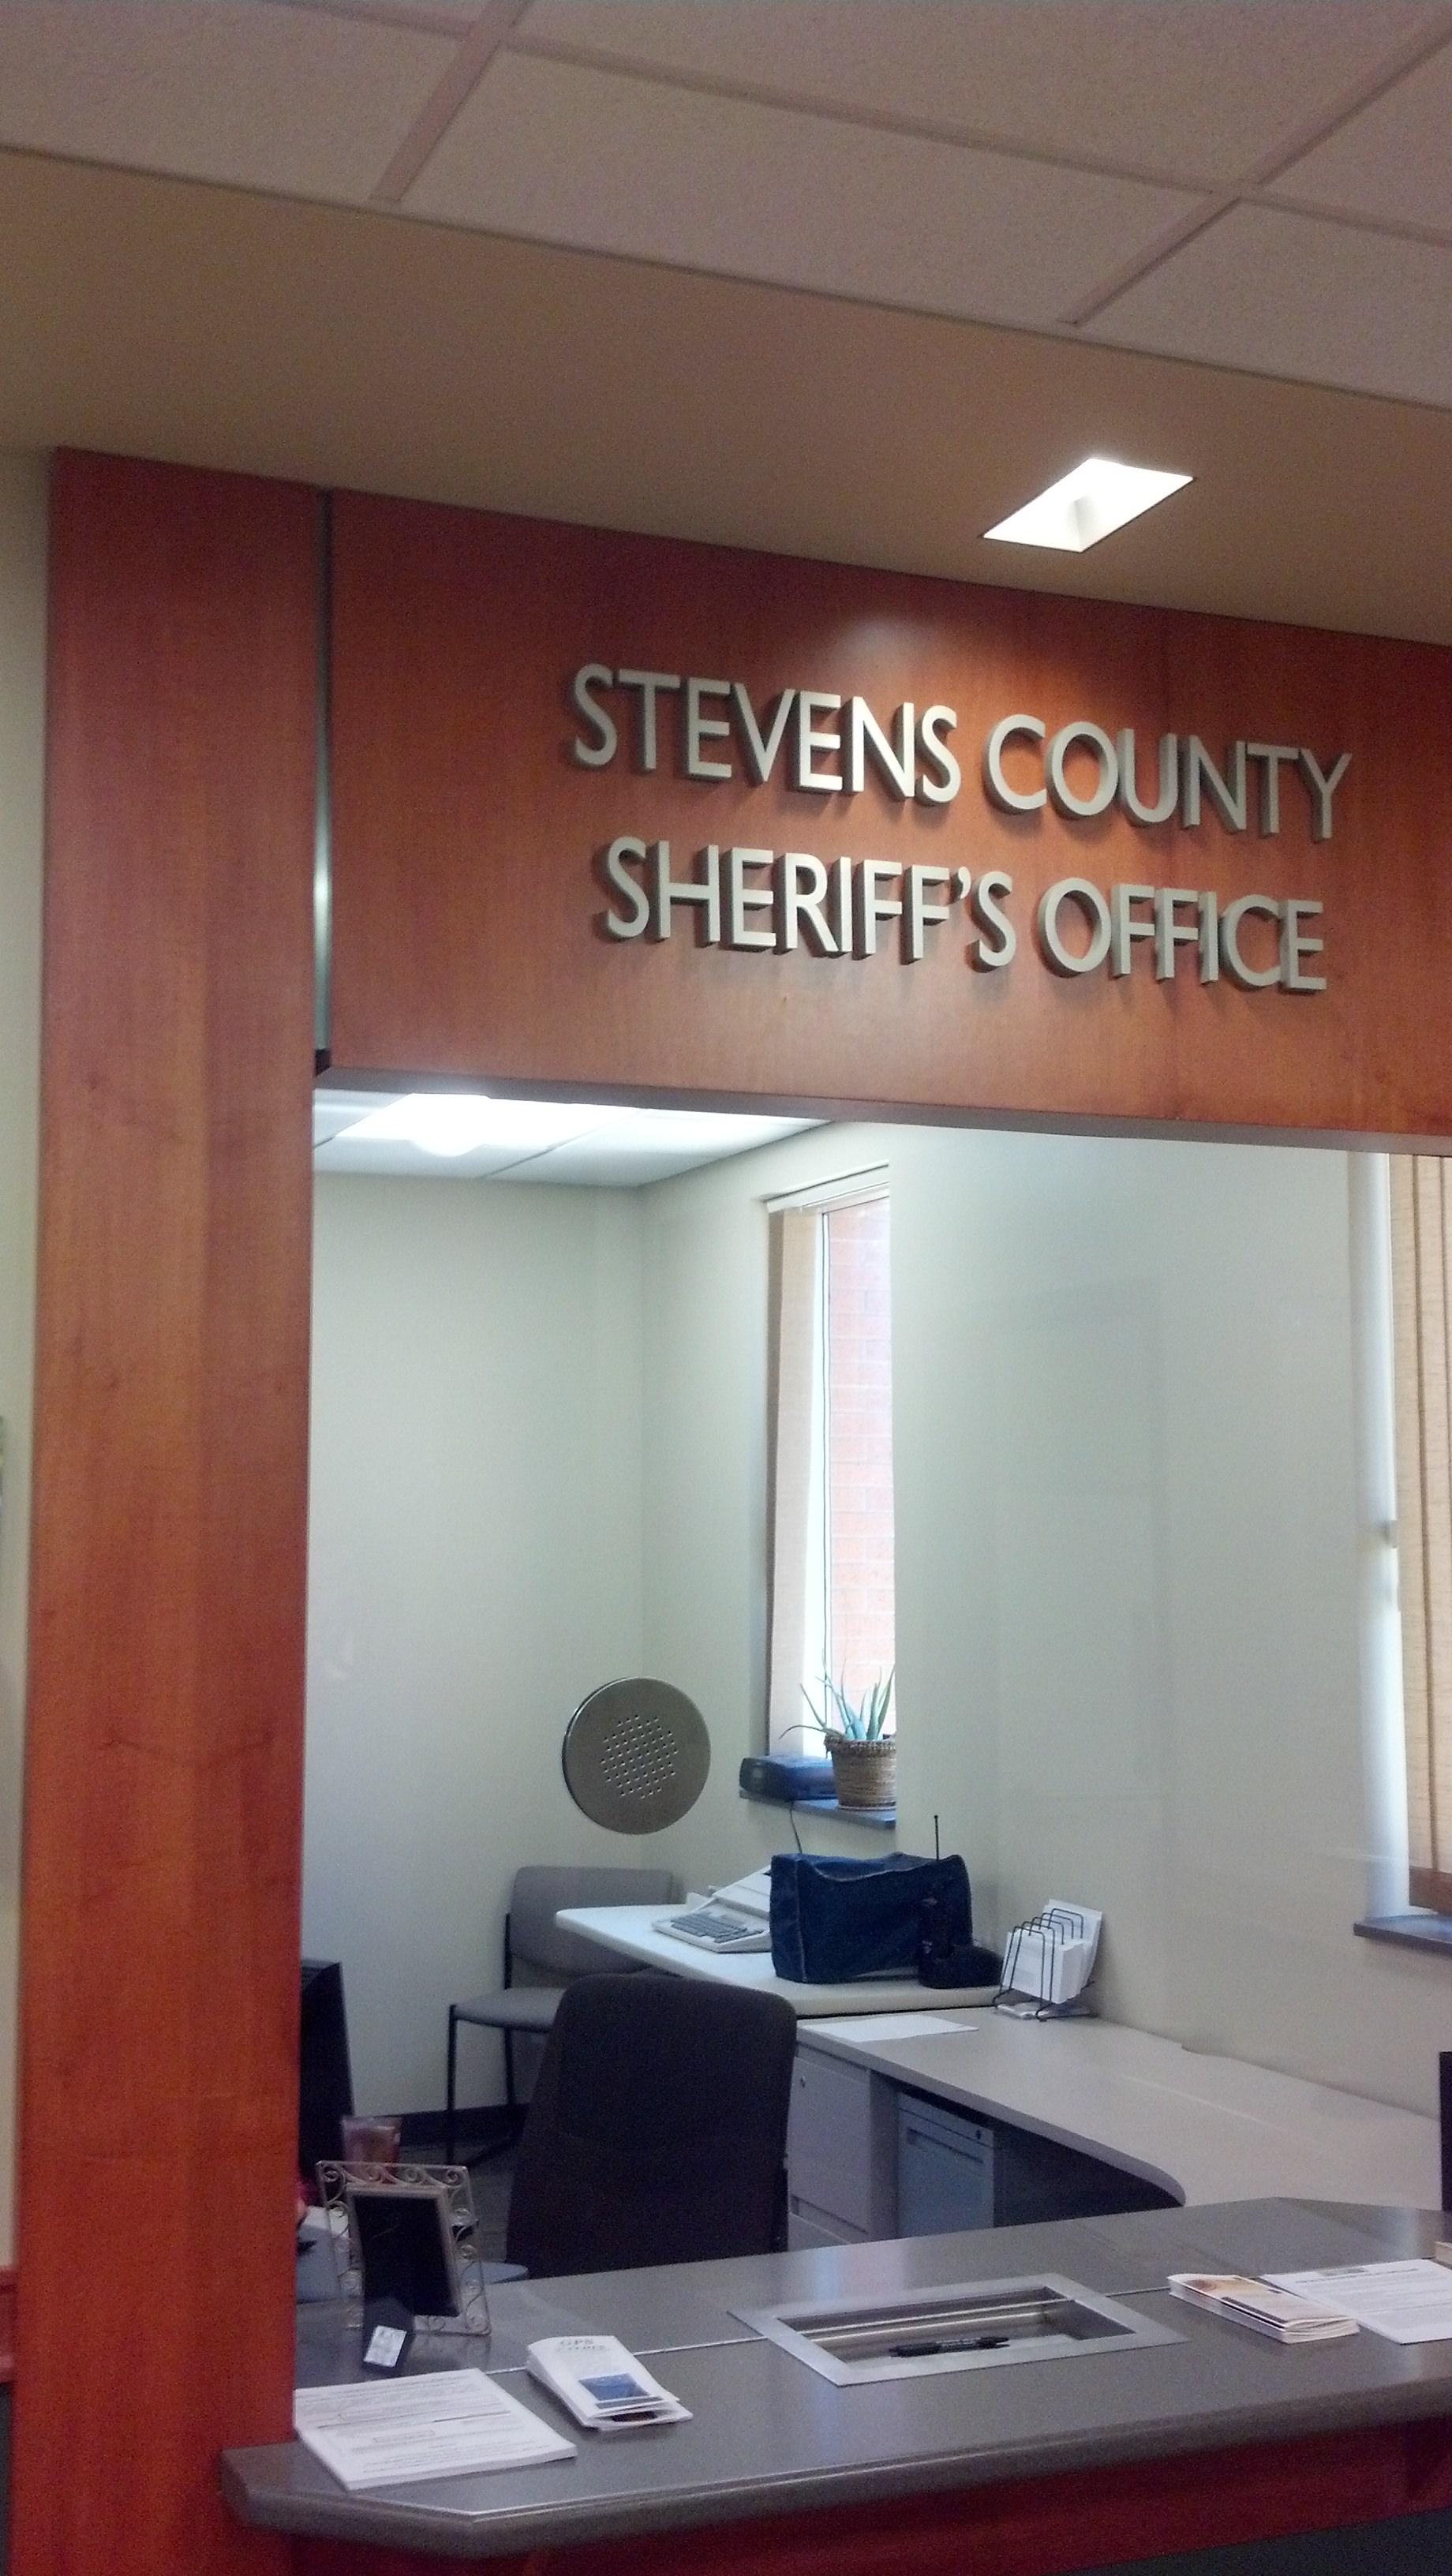 Steven's County Sheriff's Office